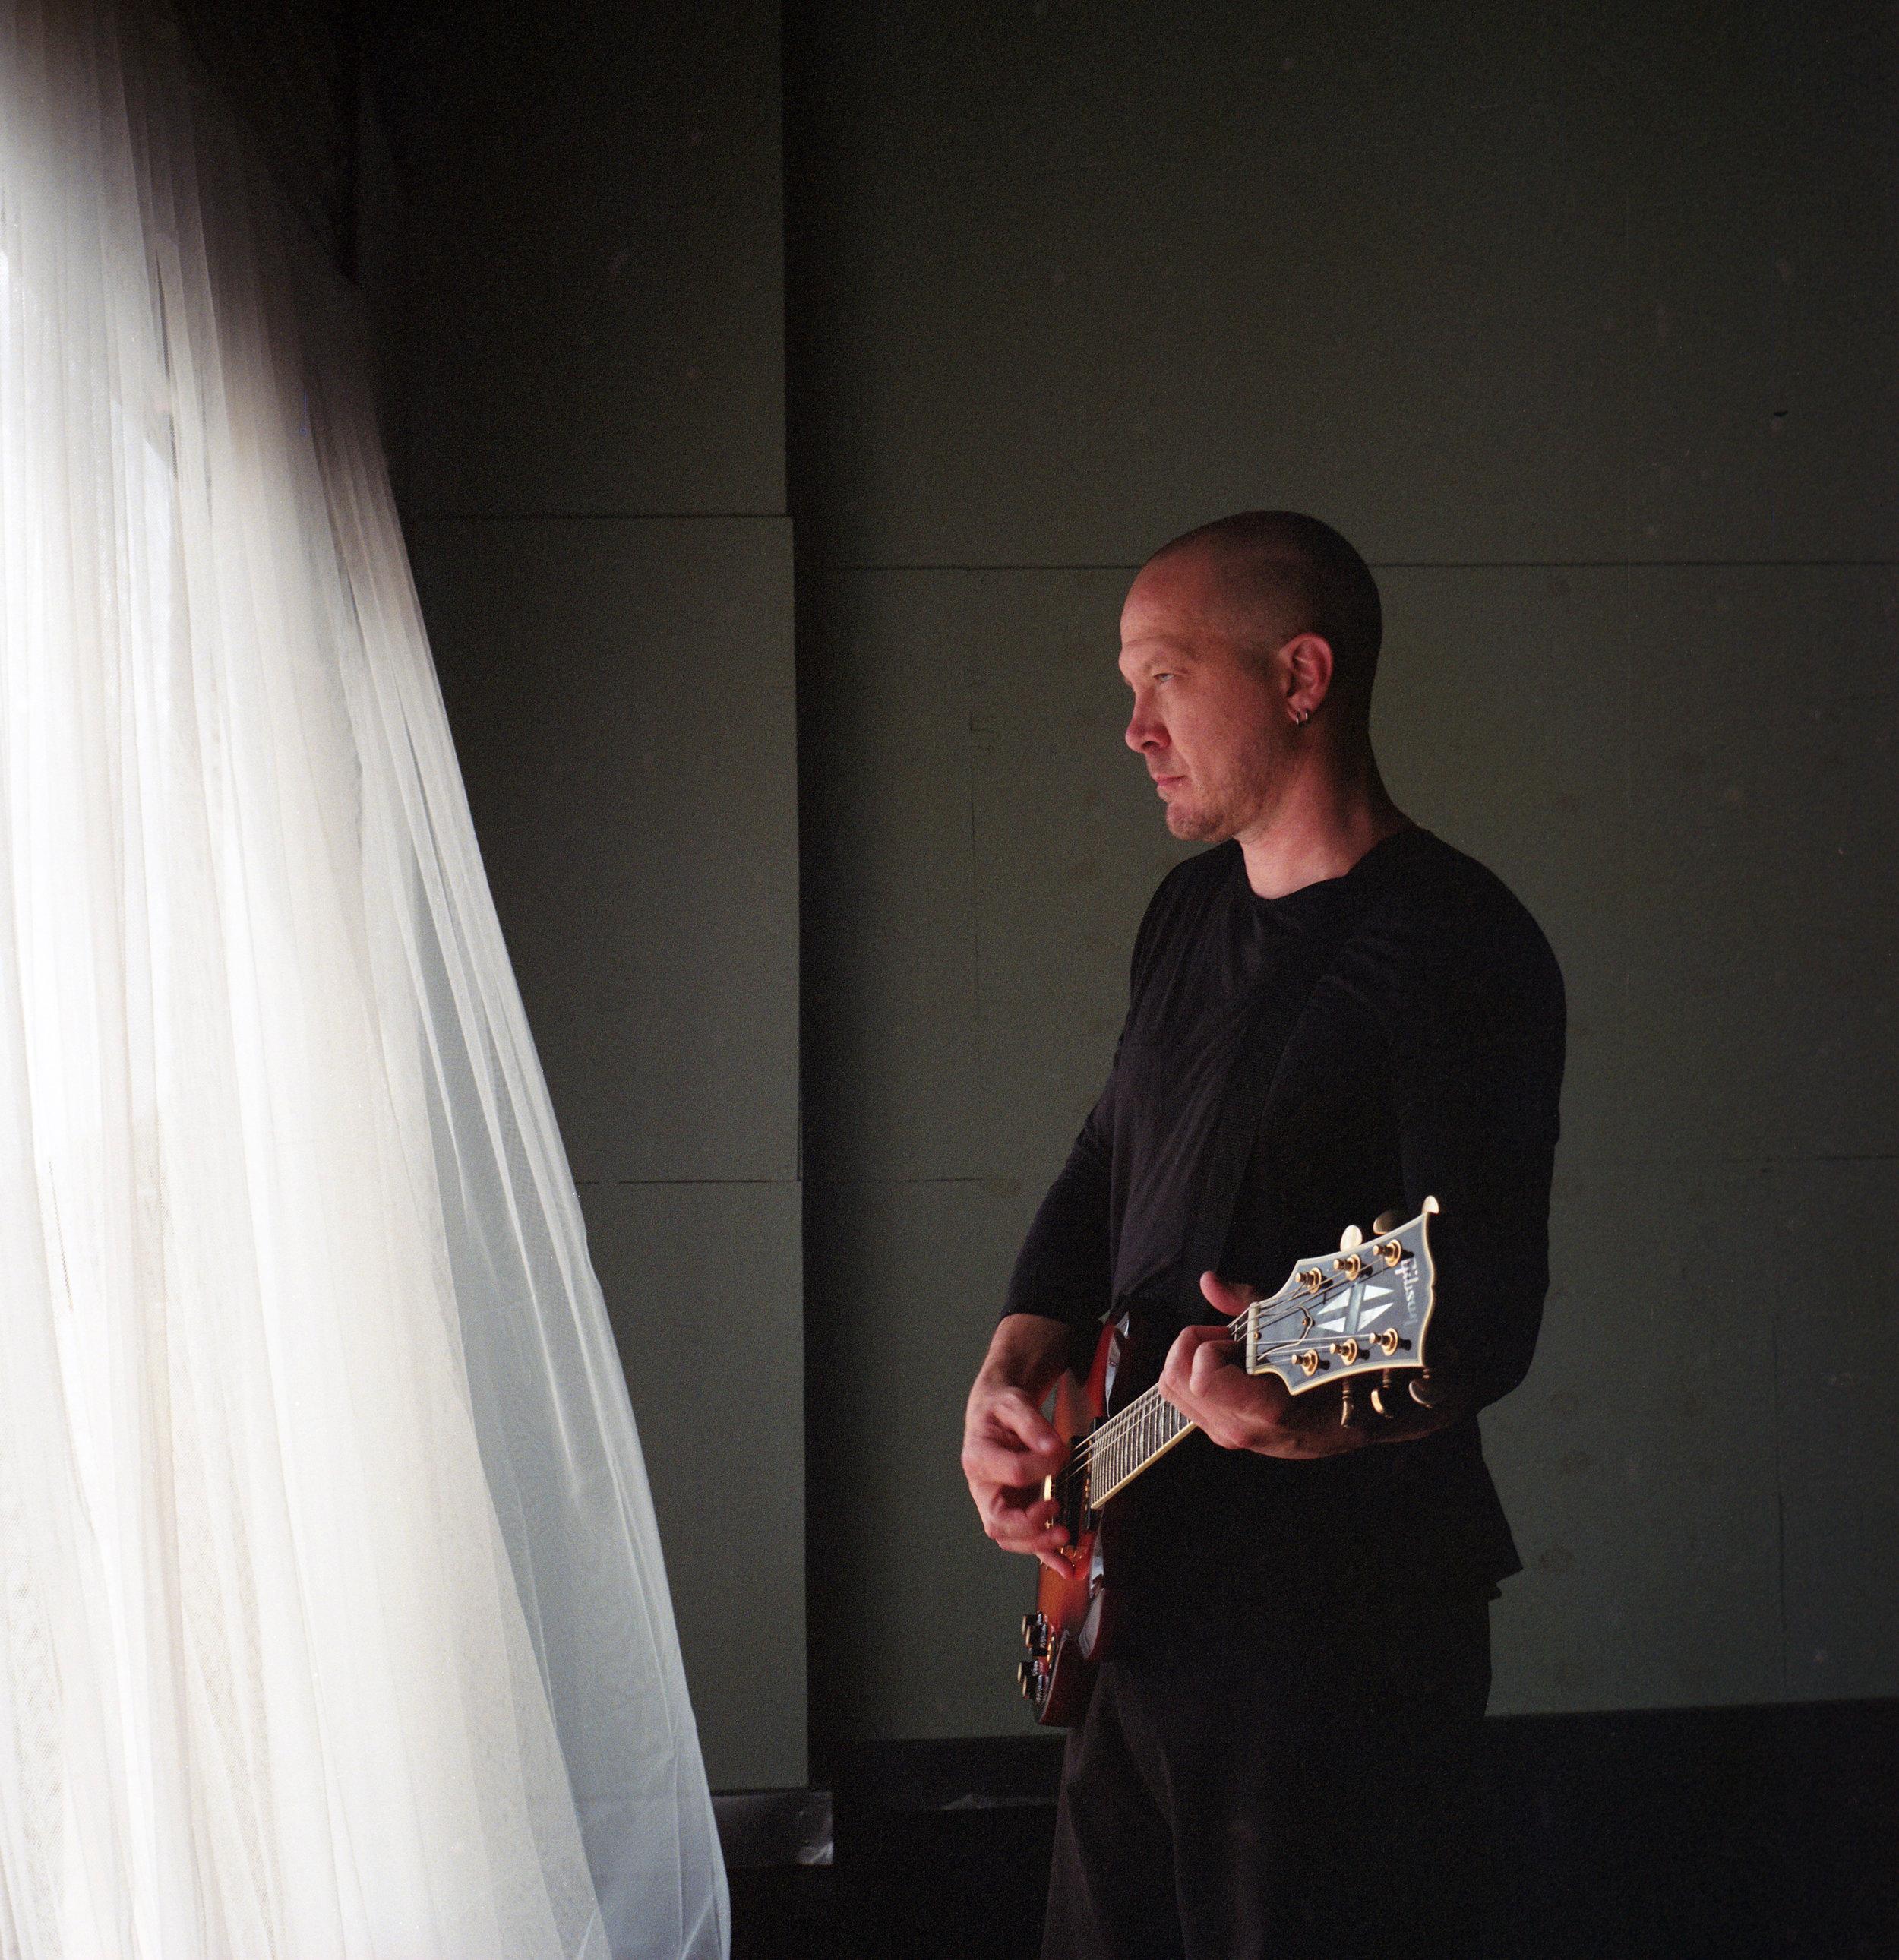 David Gibbs, Musician